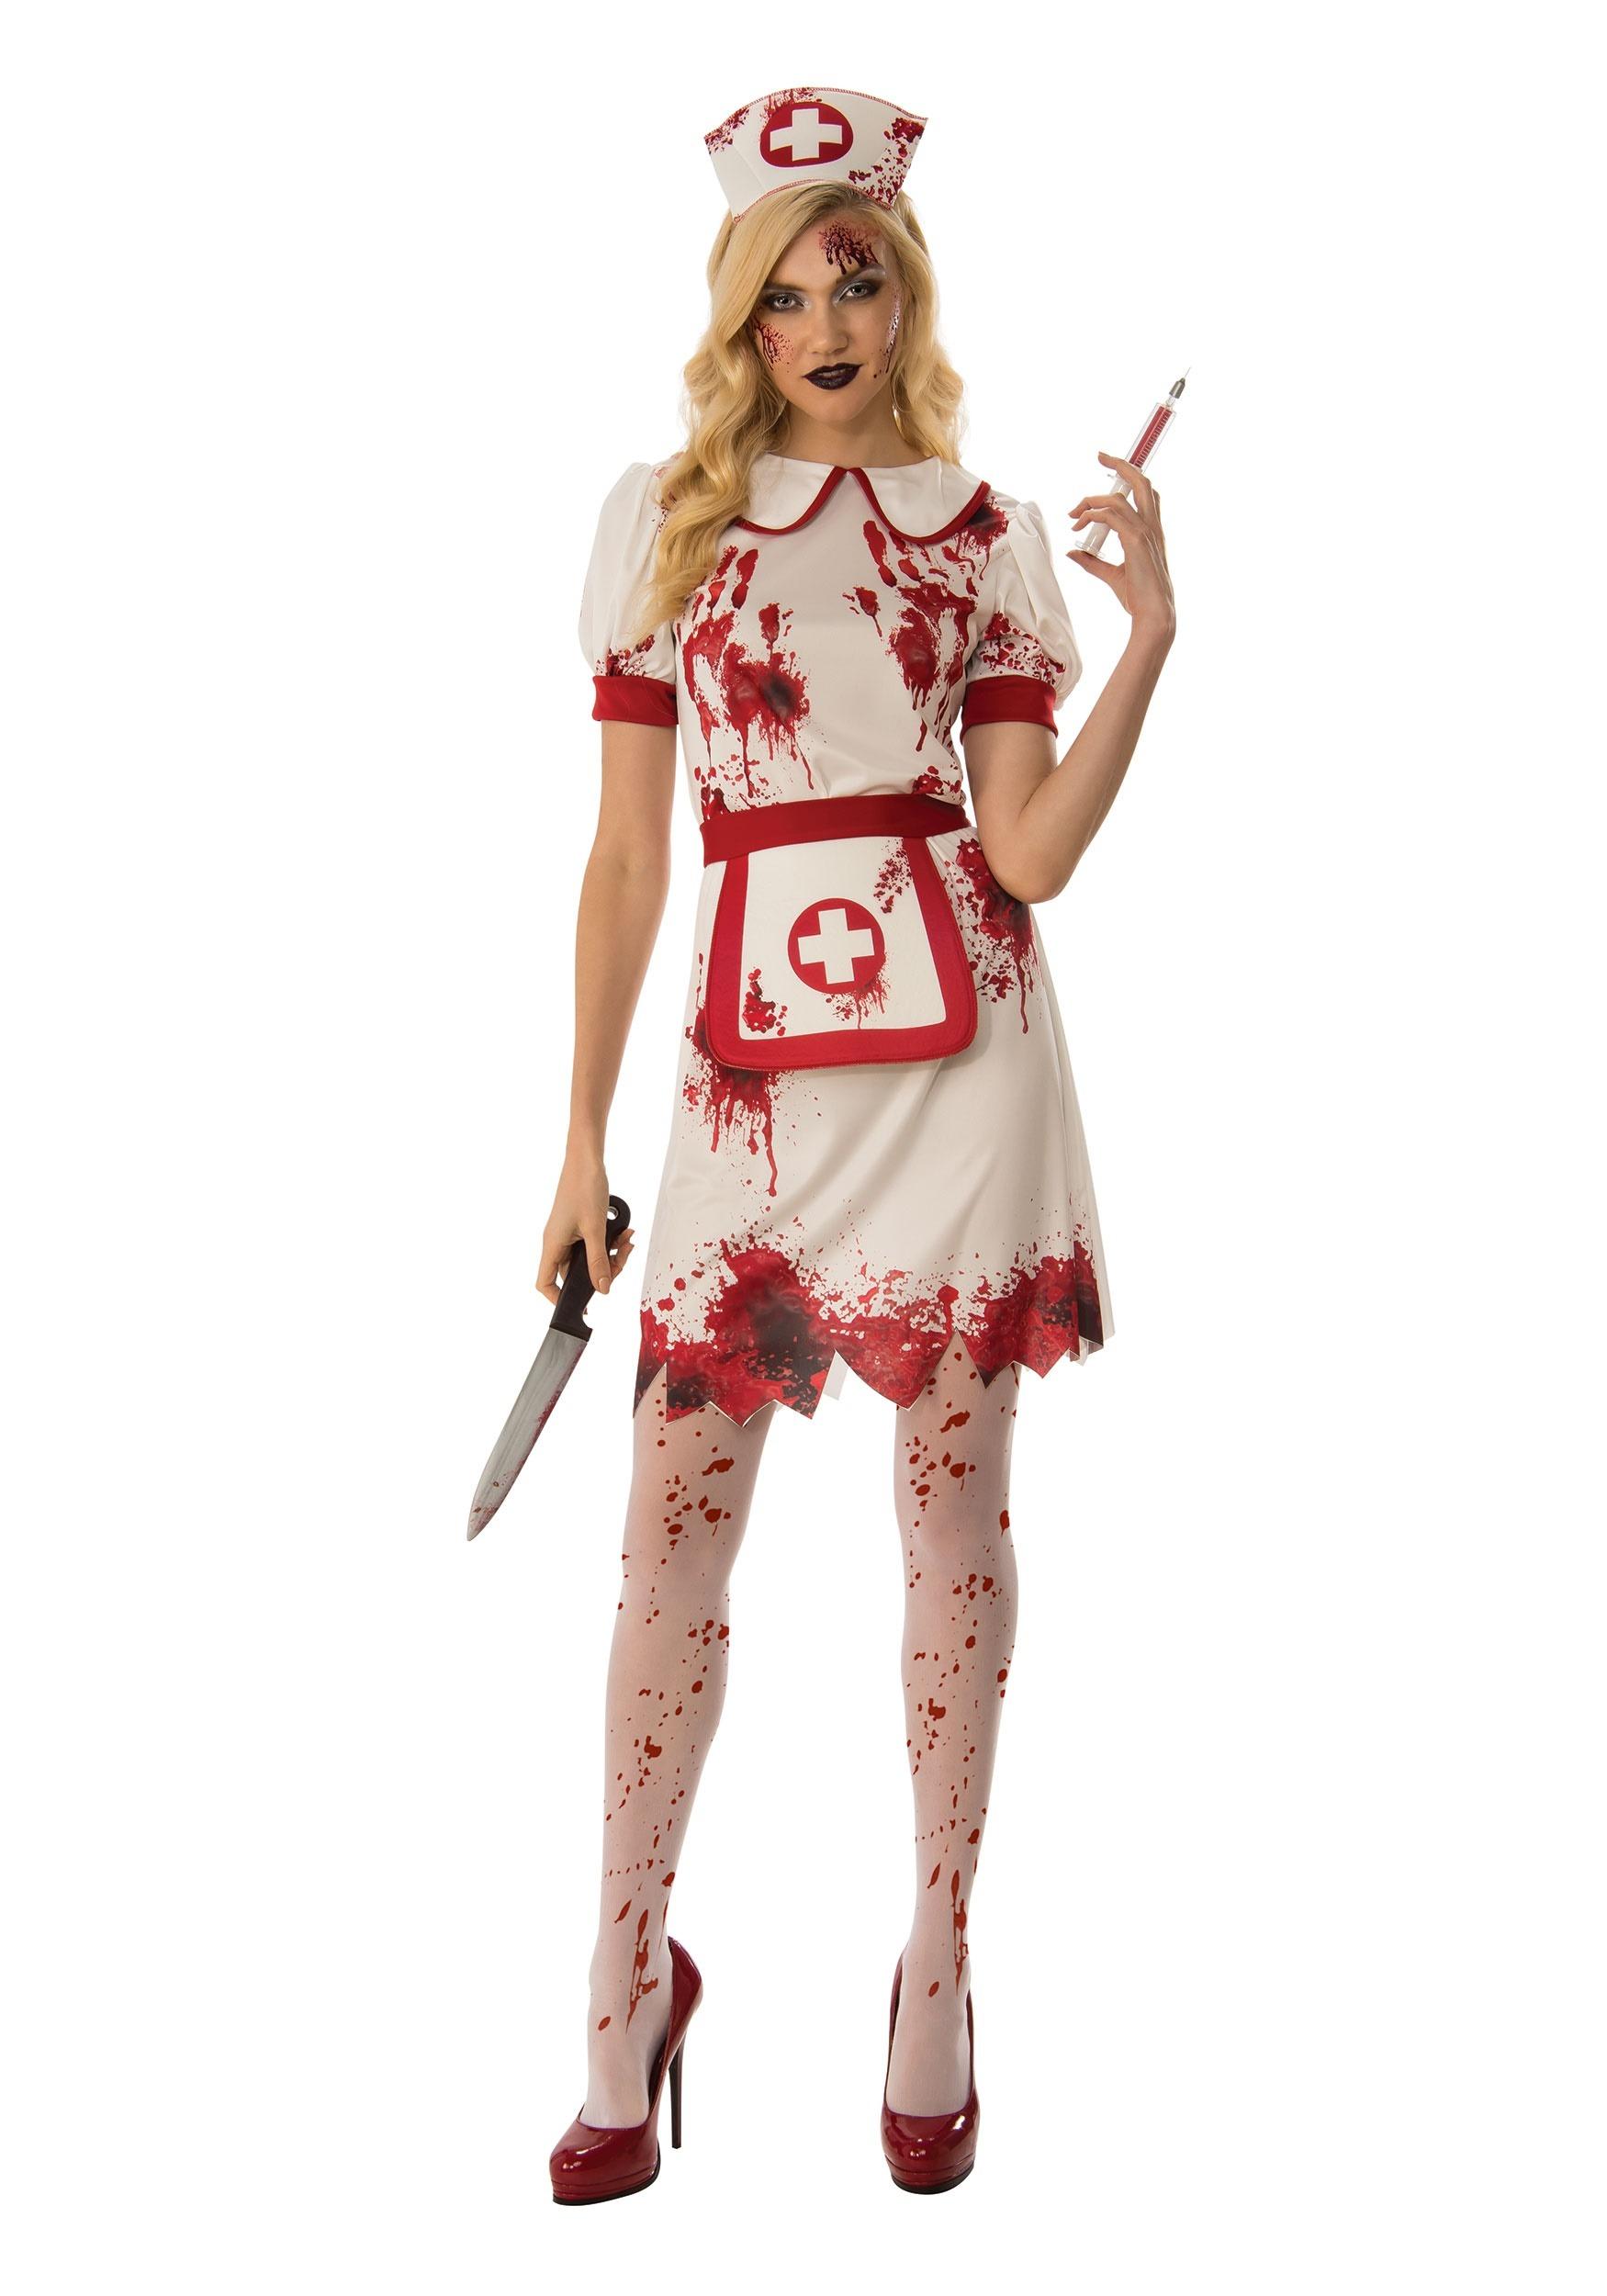 LADIES BLOODY NURSE COSTUME WITH BLOODY TIGHTS HOSPITAL HALLOWEEN FANCY DRESS